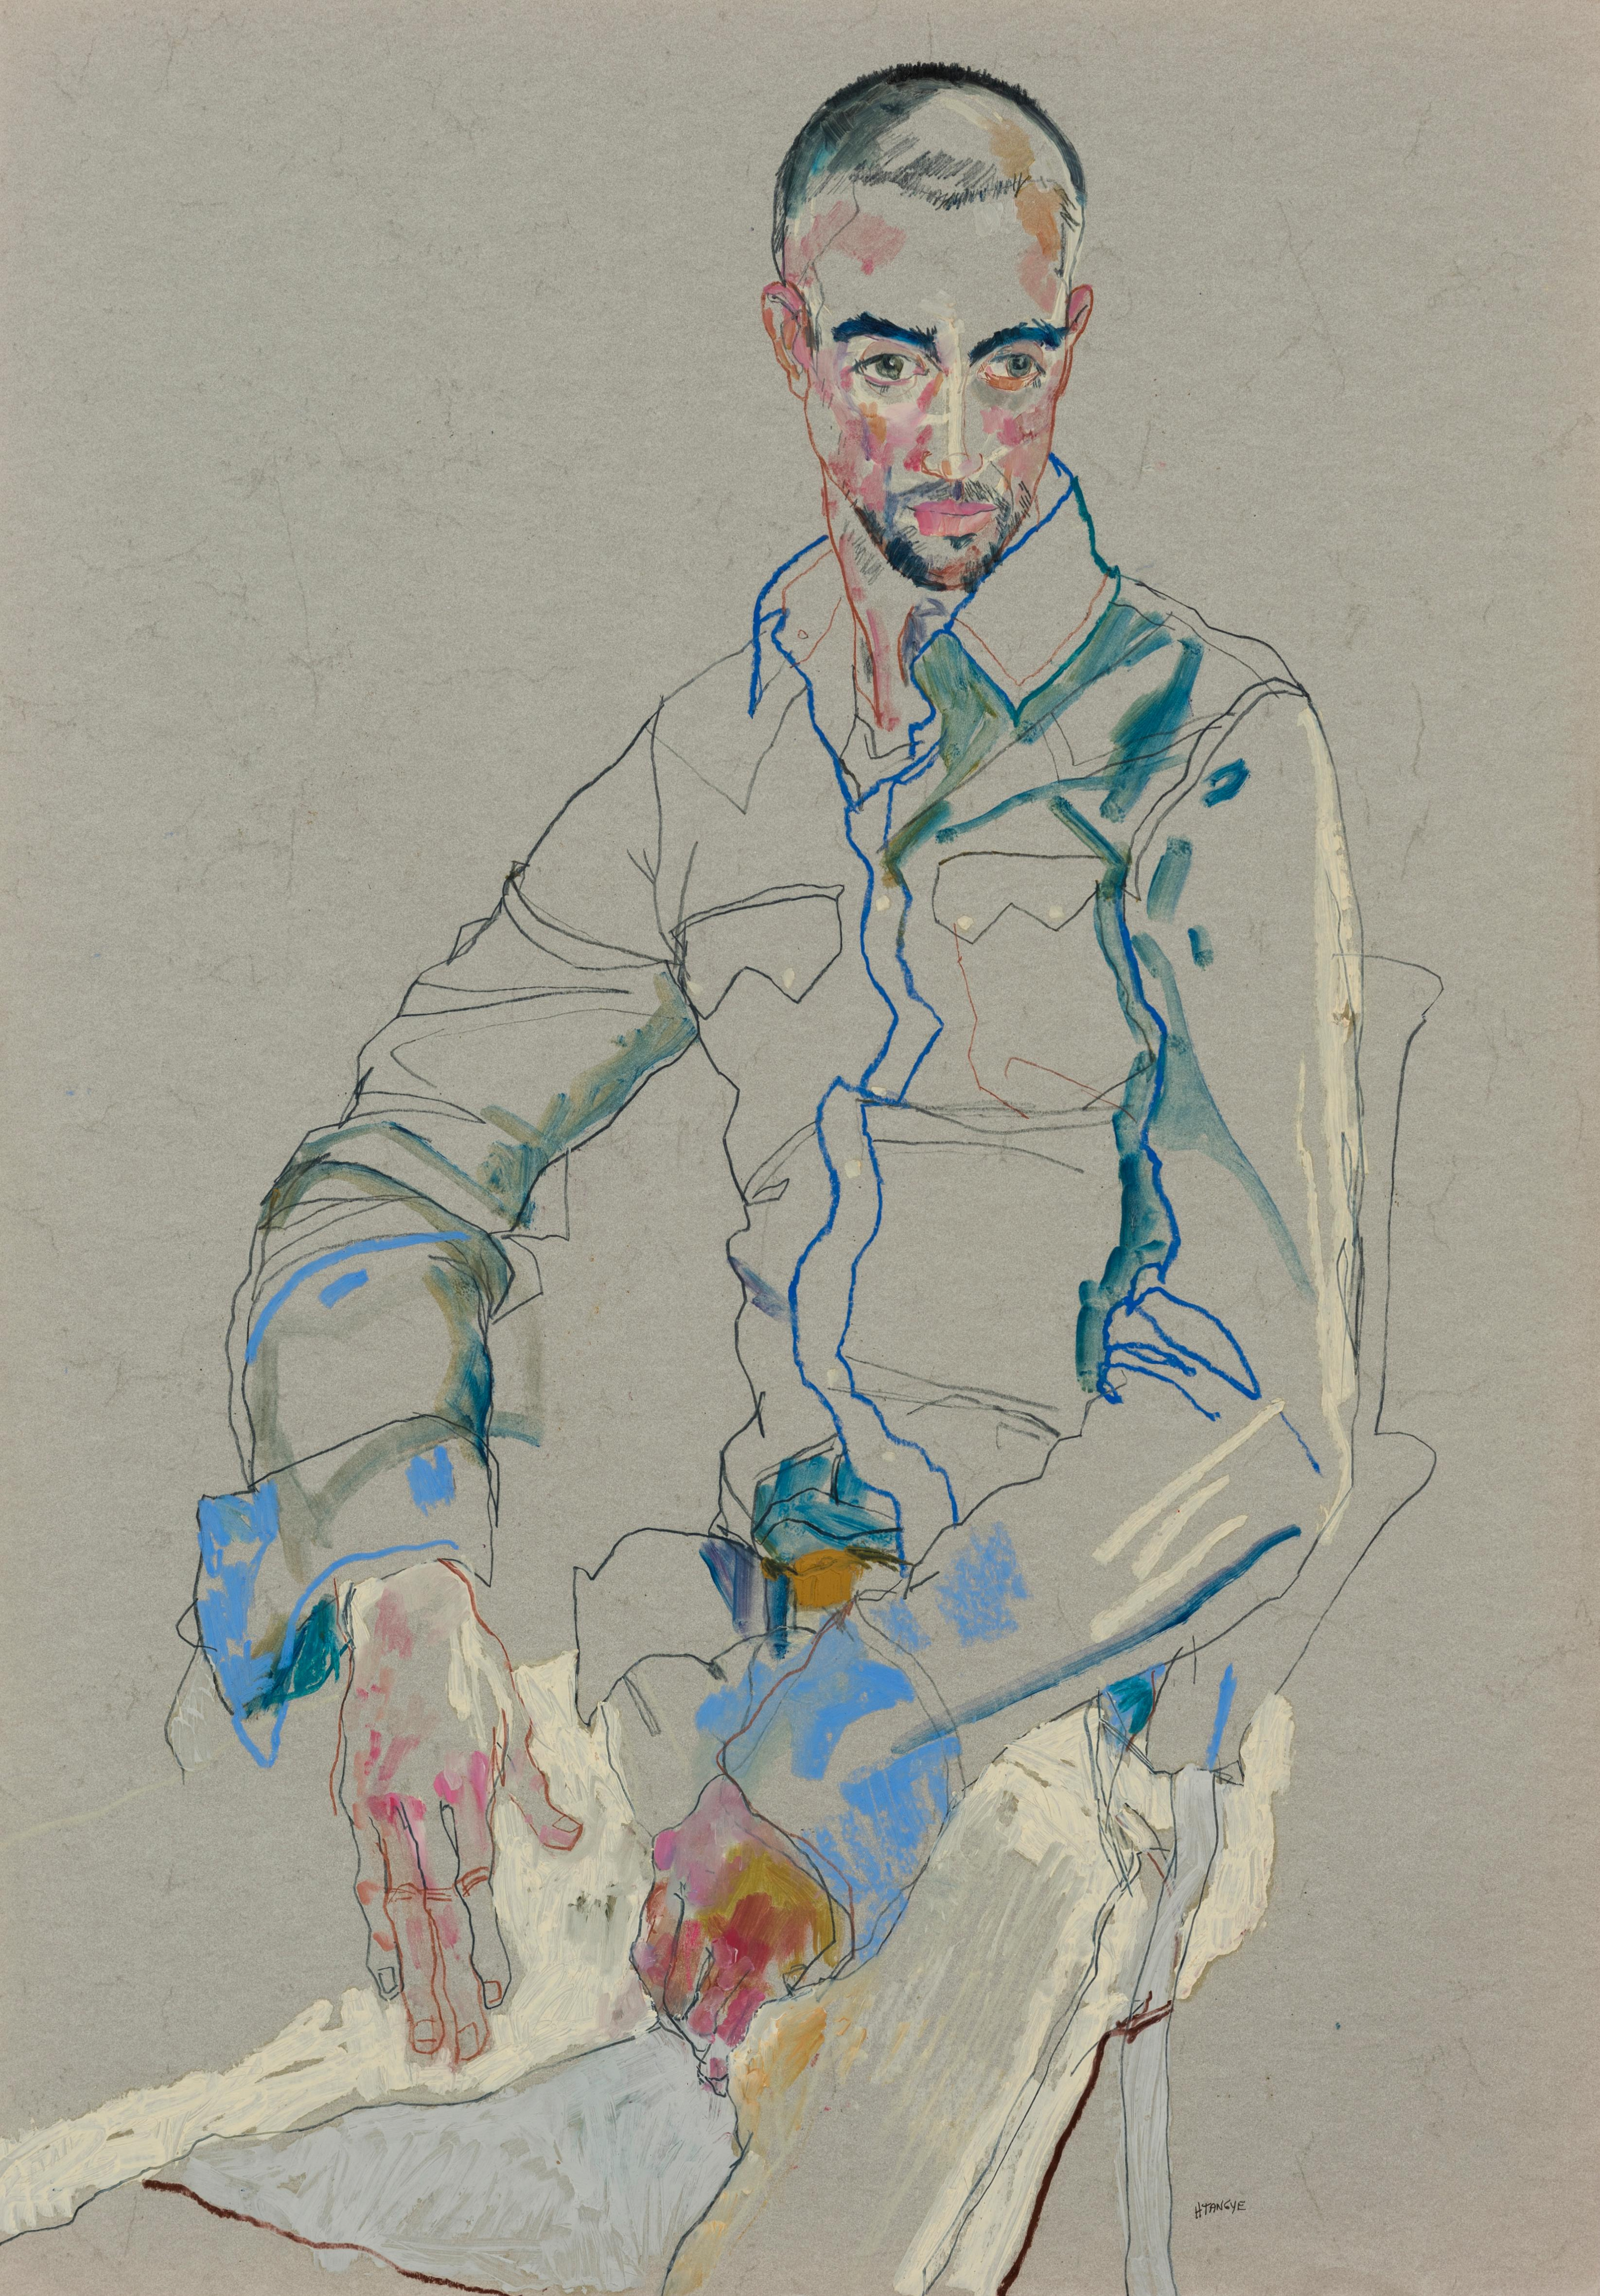 Craig (Richard's Friend - Sitting - Blue Jacket), Mixed media on grey parchment